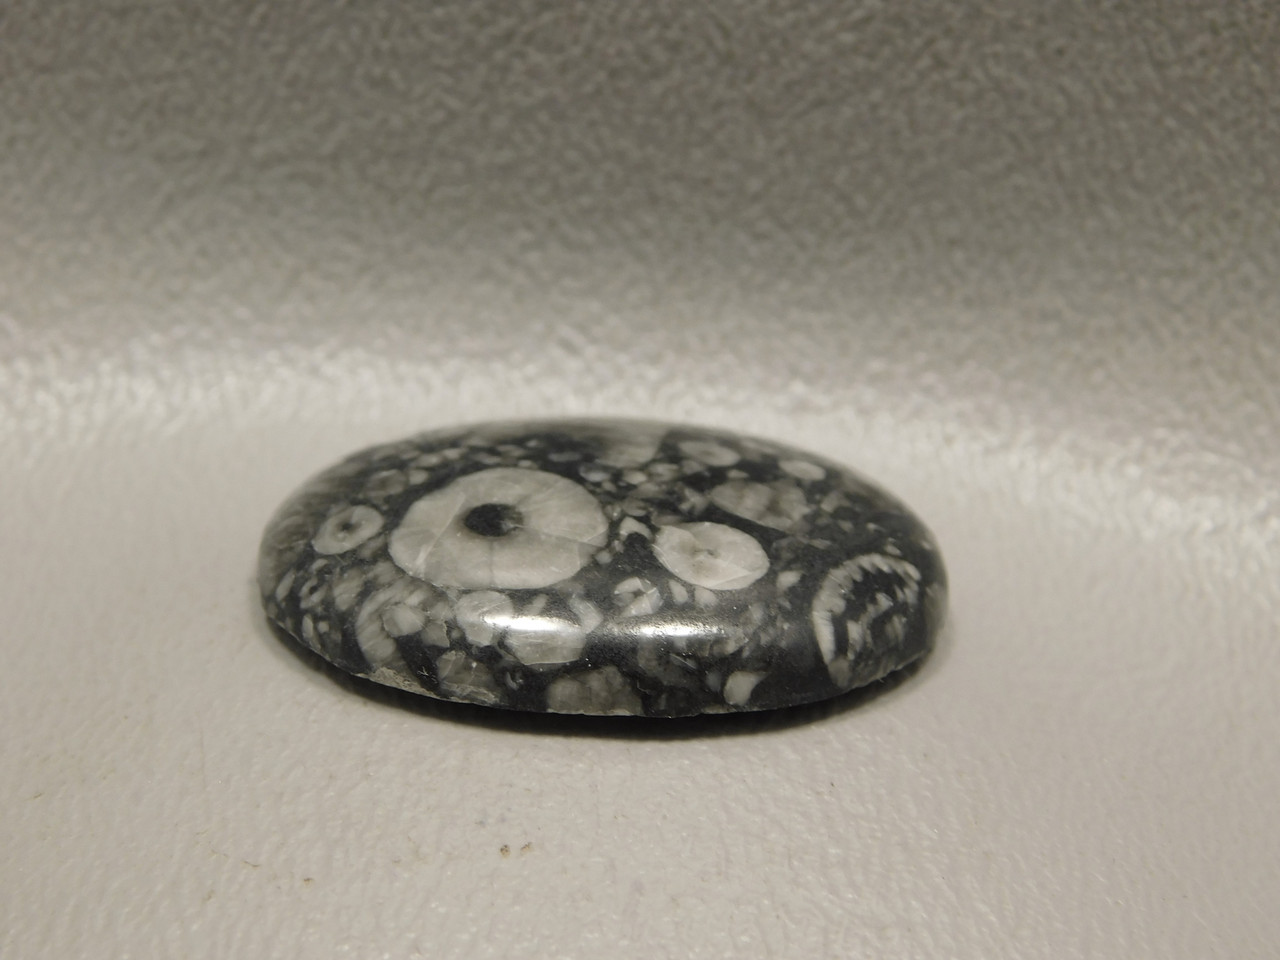 Crinoid Marble Fossilized Stone Cabochon #18